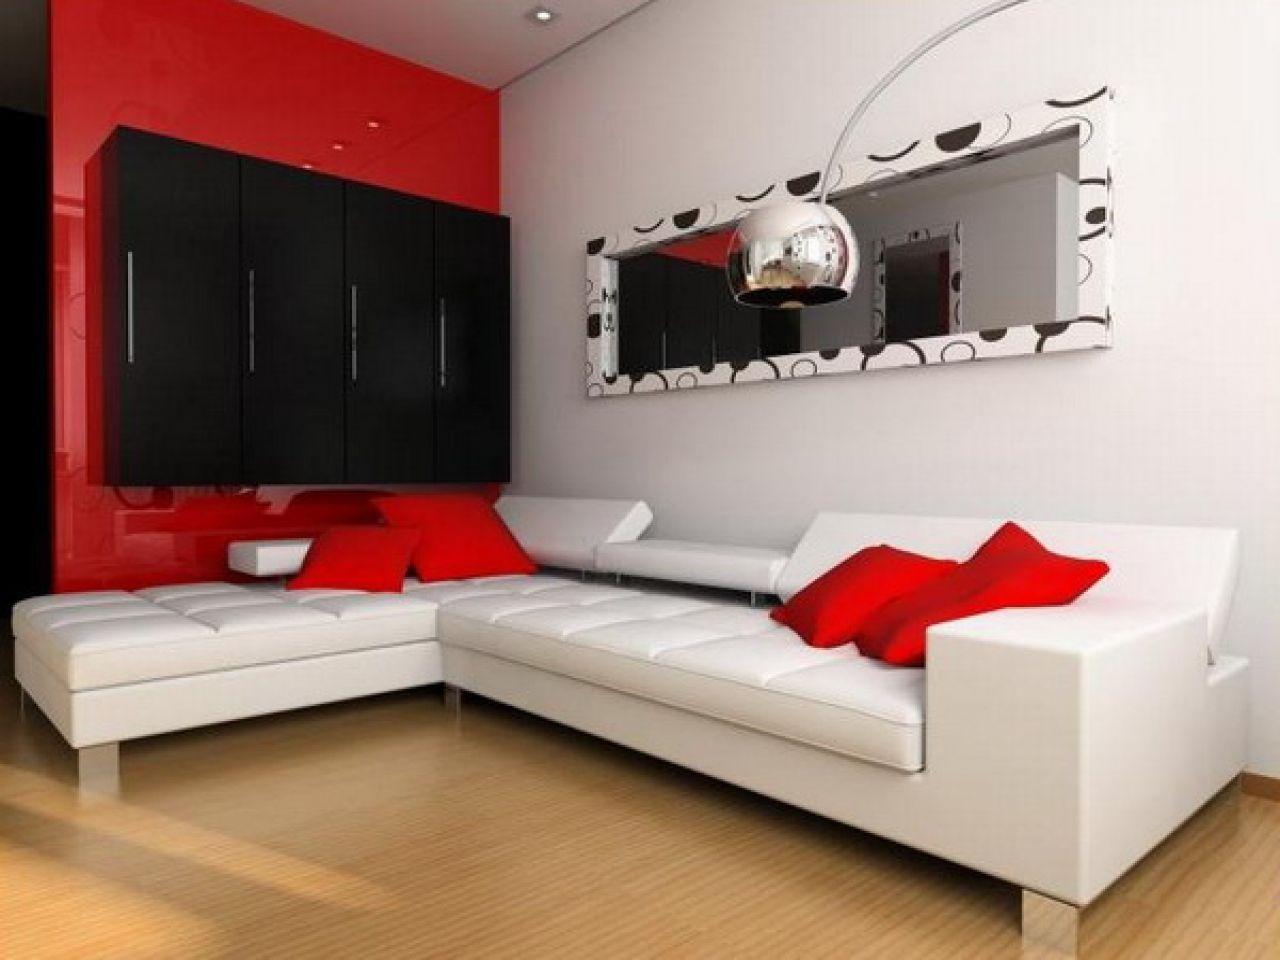 Rot Wohnzimmer design Ideen Badezimmer | Badezimmer | Pinterest